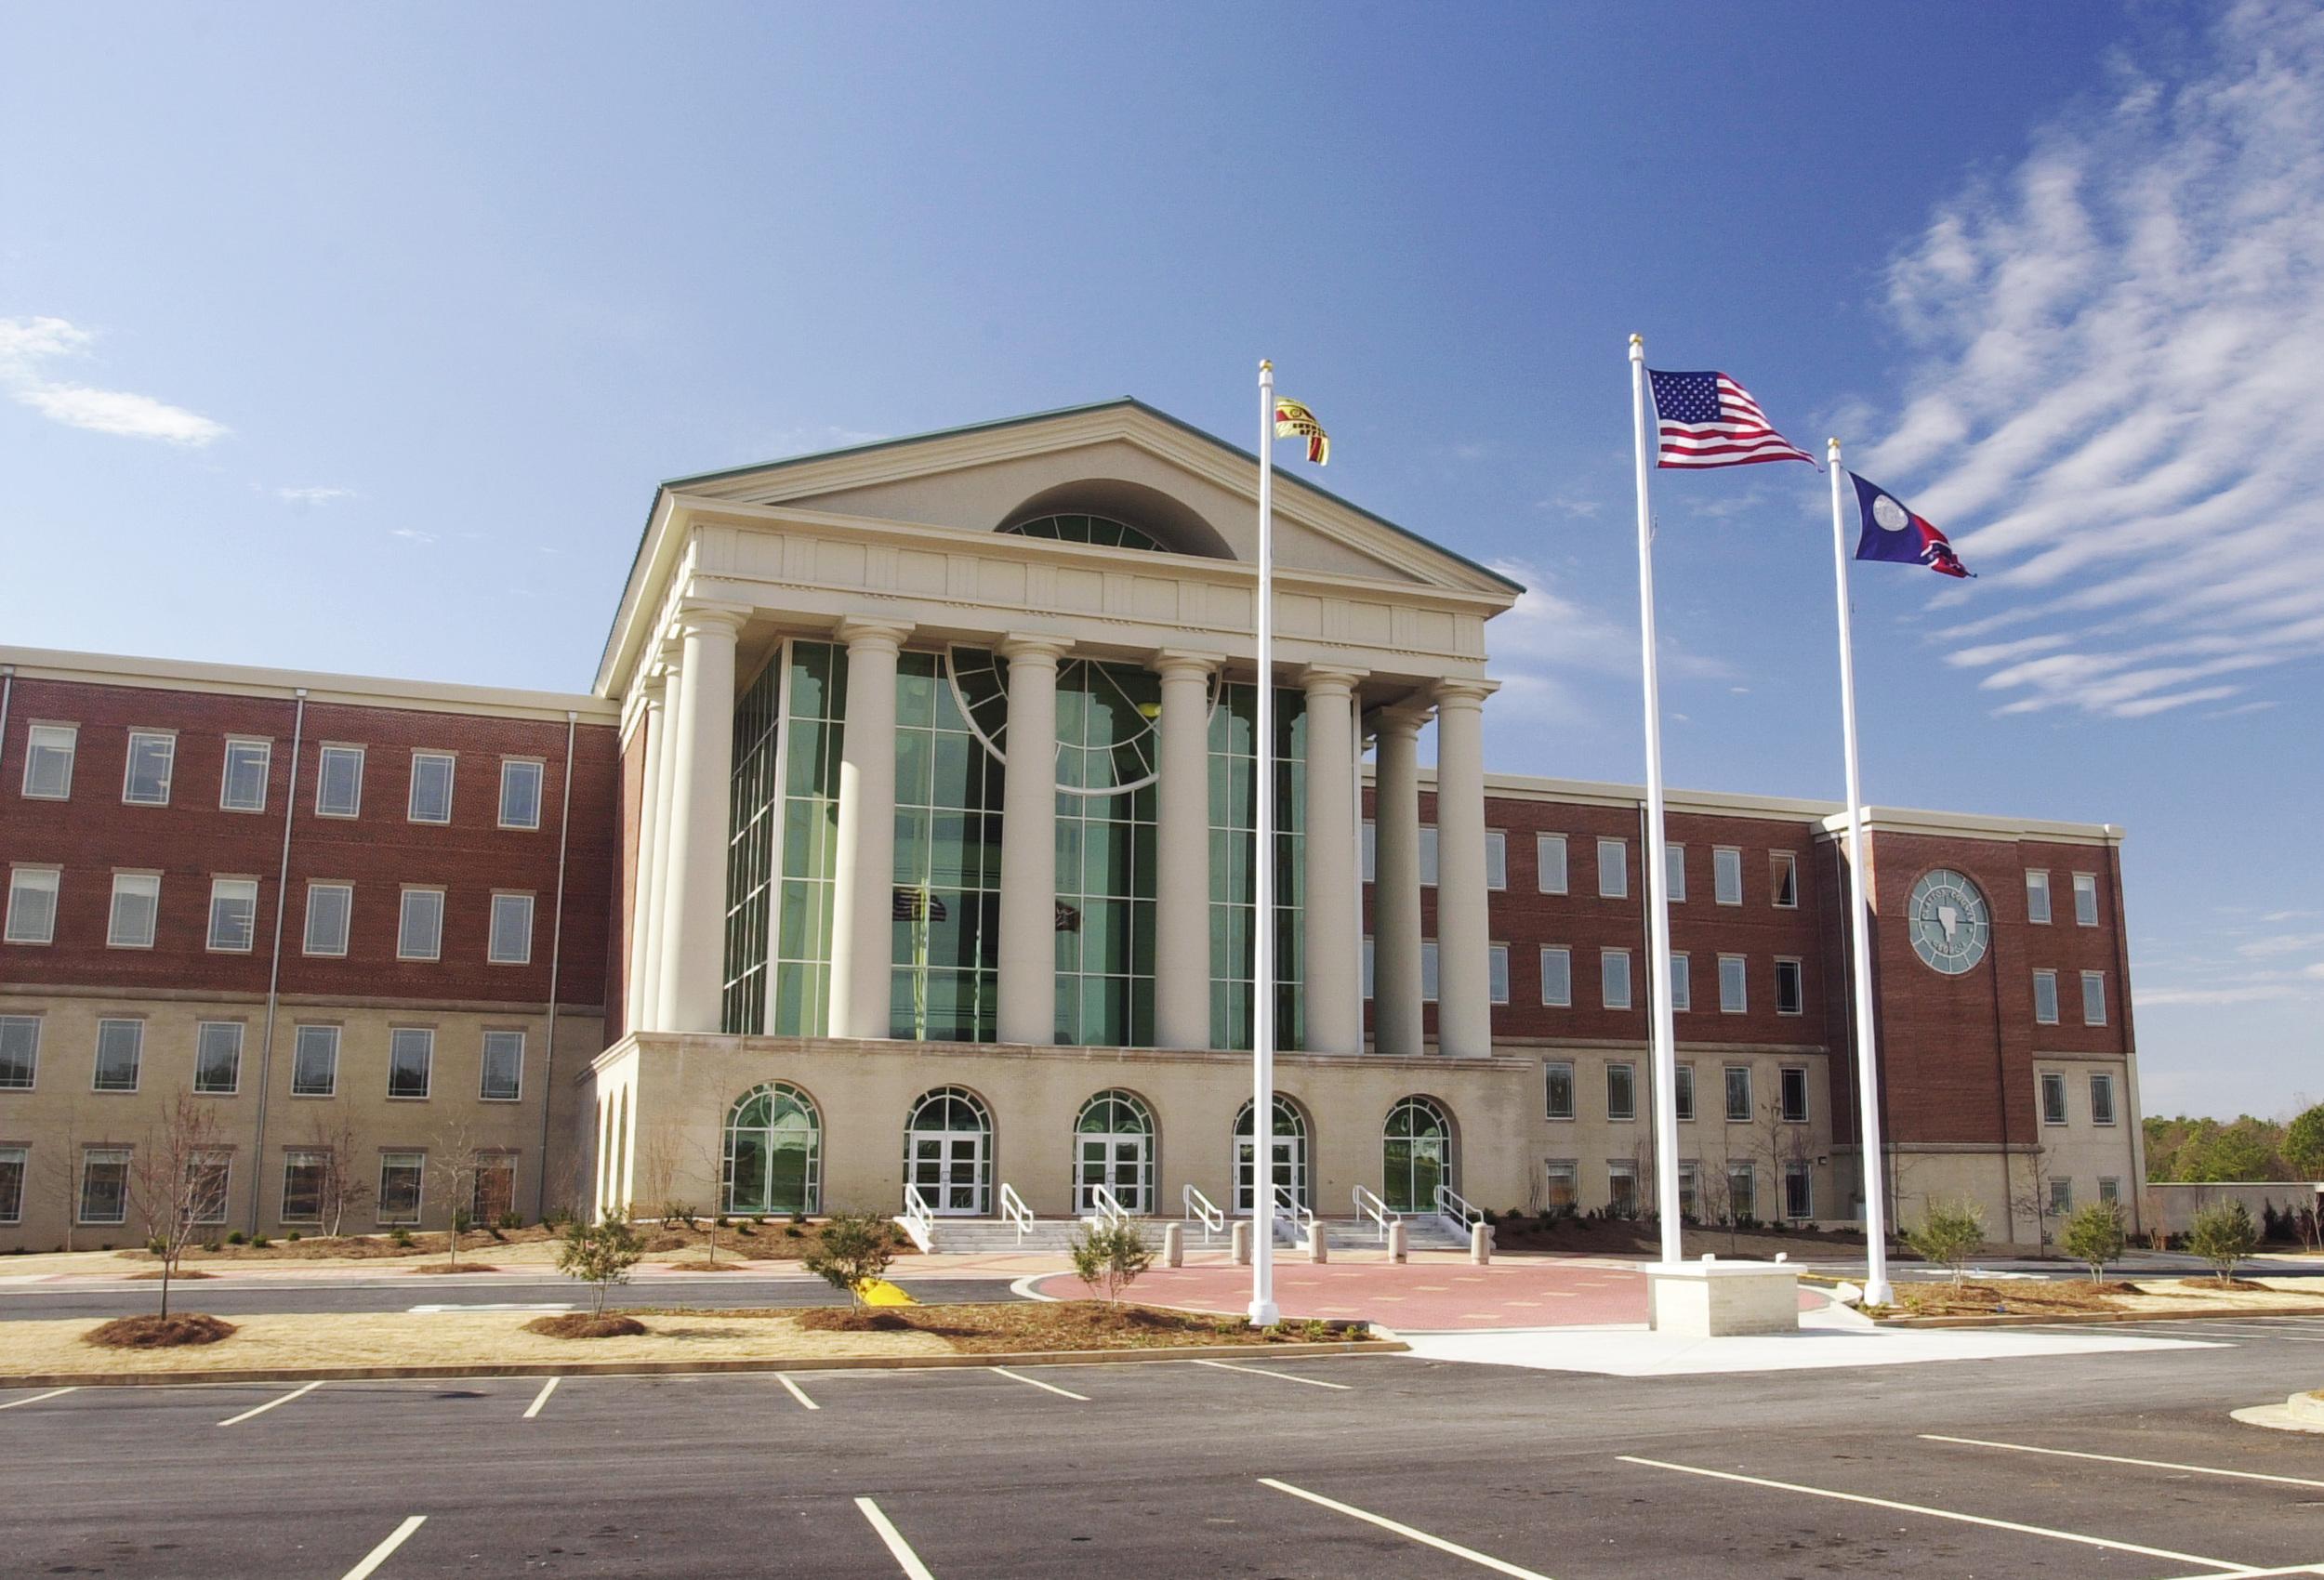 Courthouse-New Courthouse-60-01.jpeg